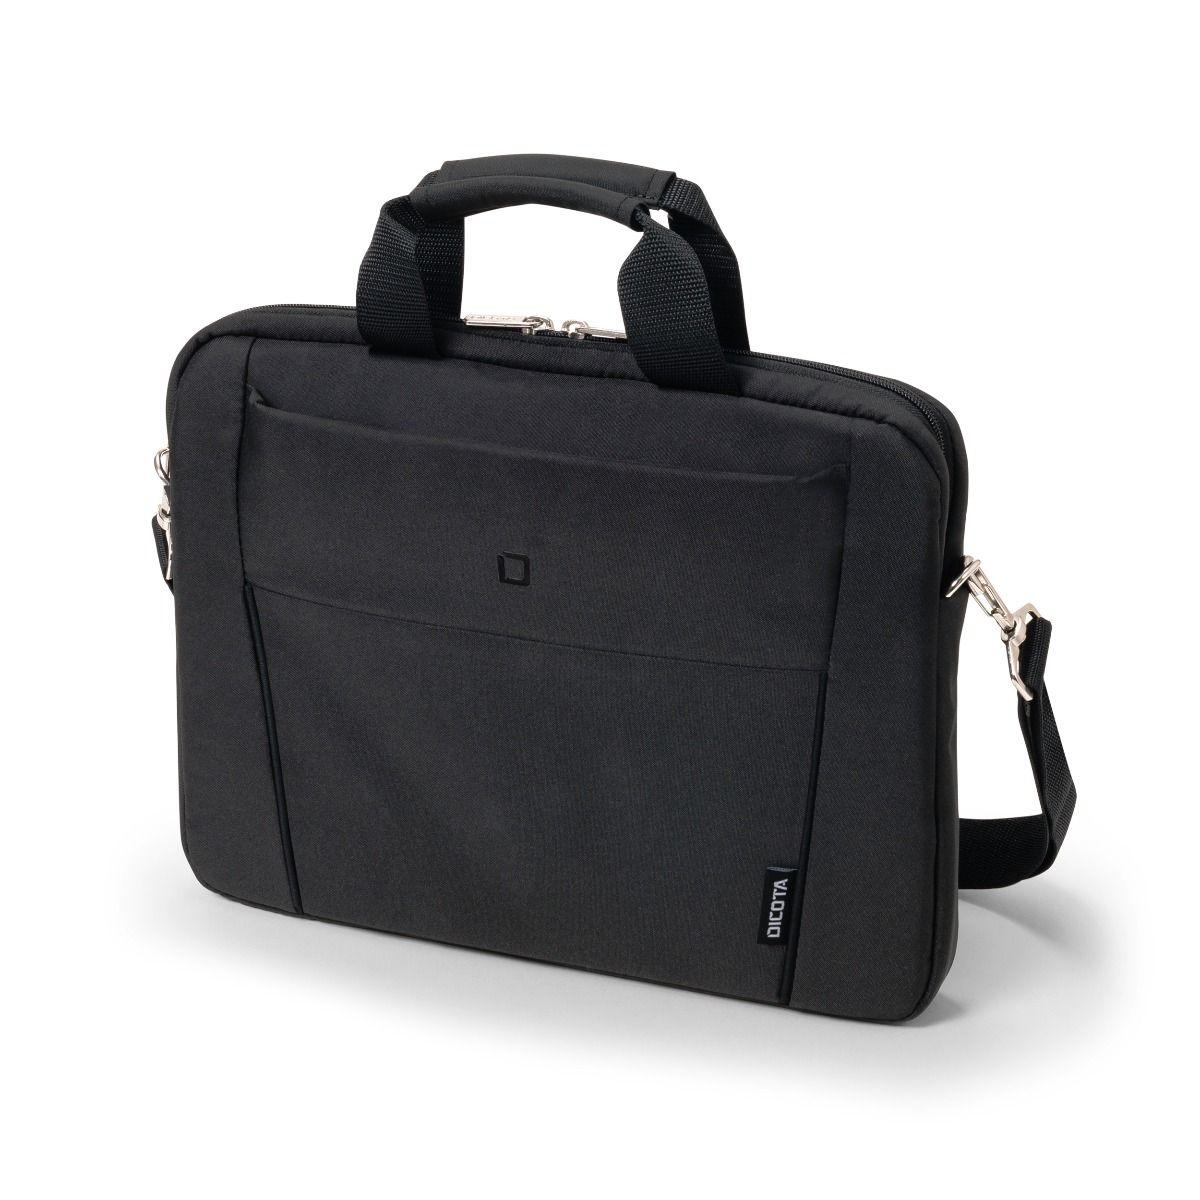 "Dicota Slim Case Base 13-14.1 35.8 cm (14.1"") Messenger case Black"